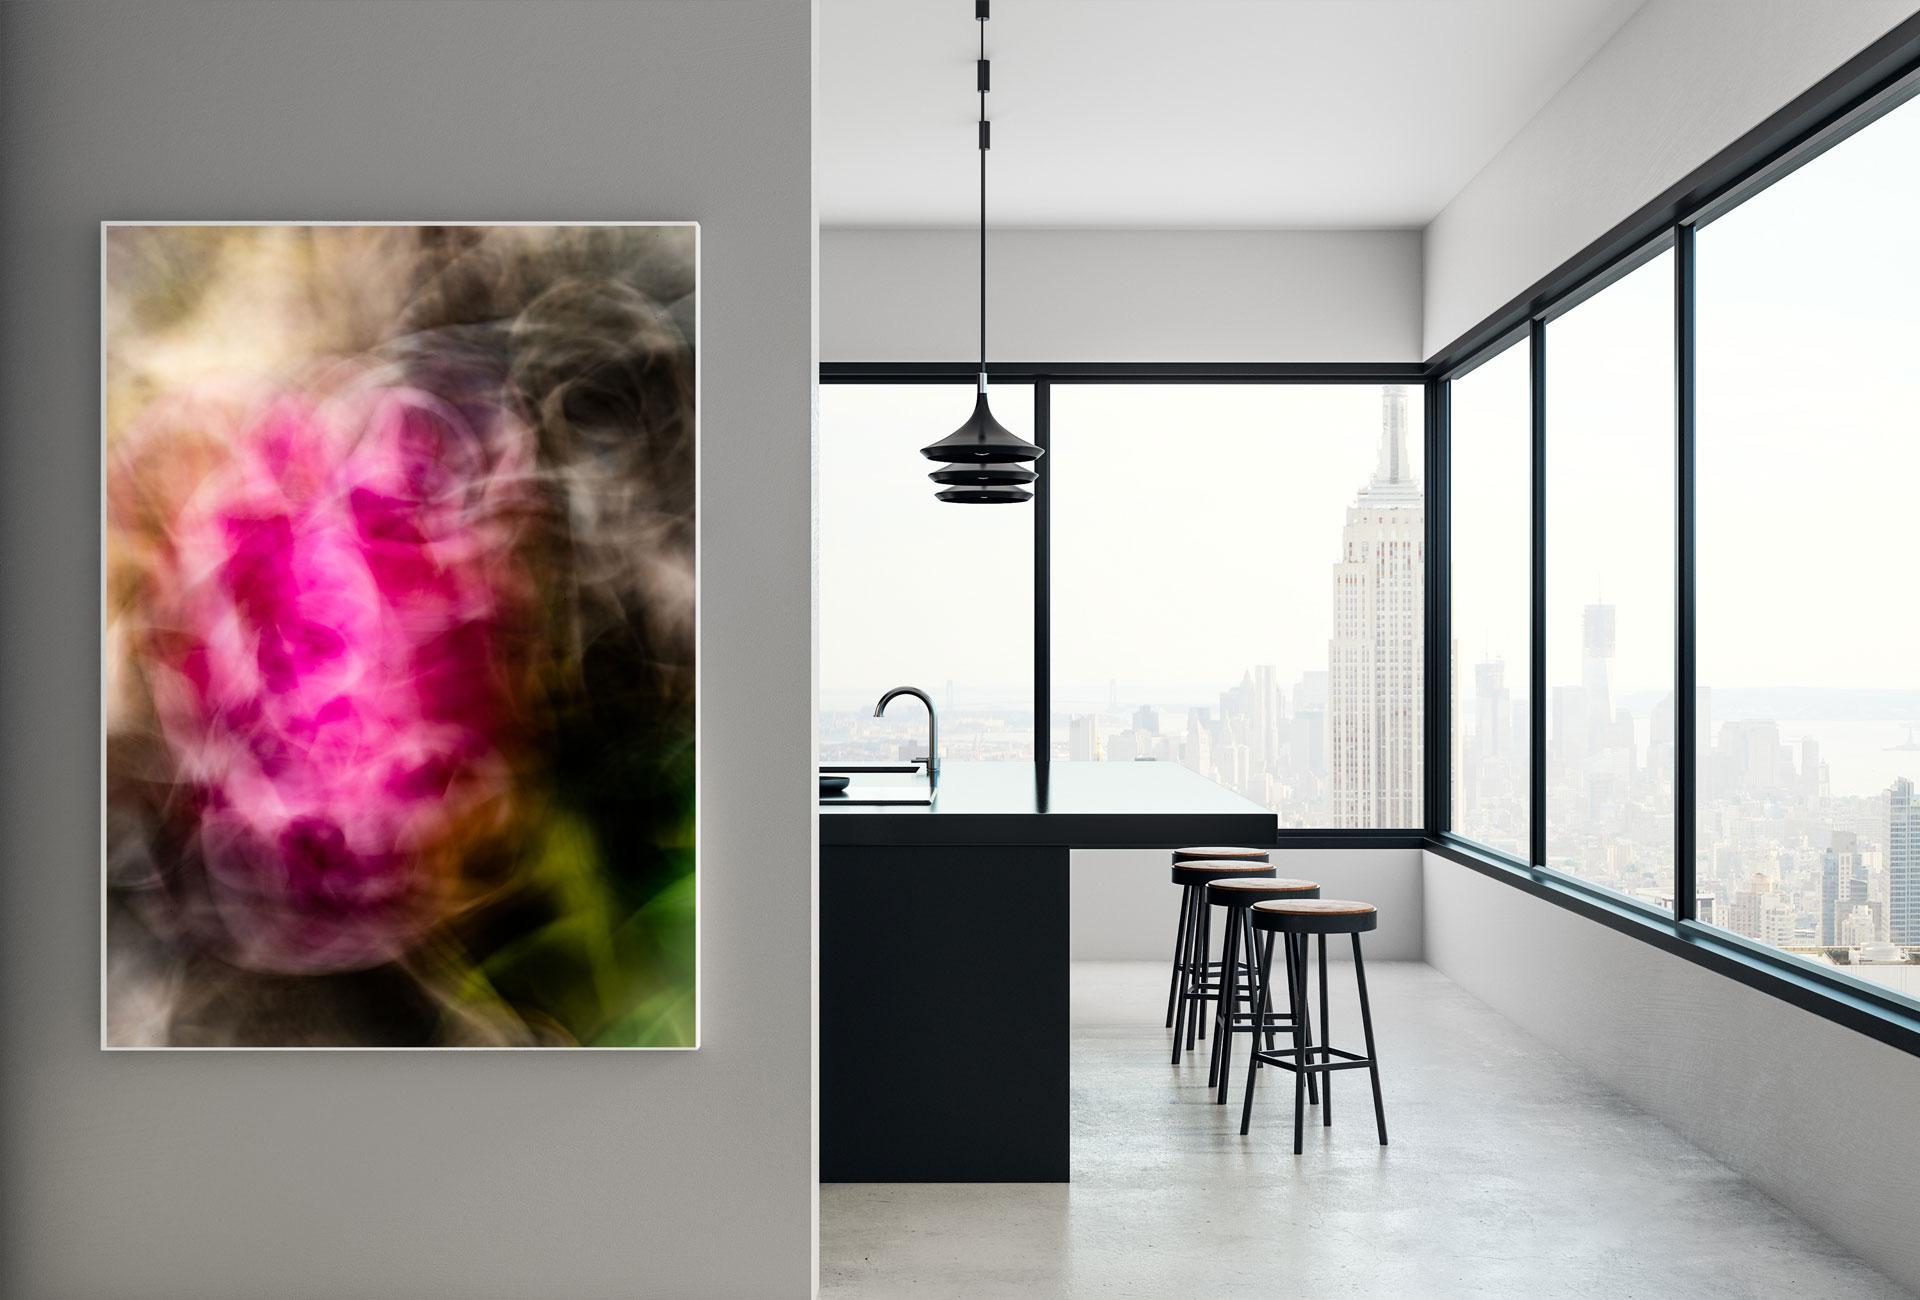 simoarts-com-simone-kessler-fotokunst-nuernberg-blumen-abstrakt-Motiv04-1